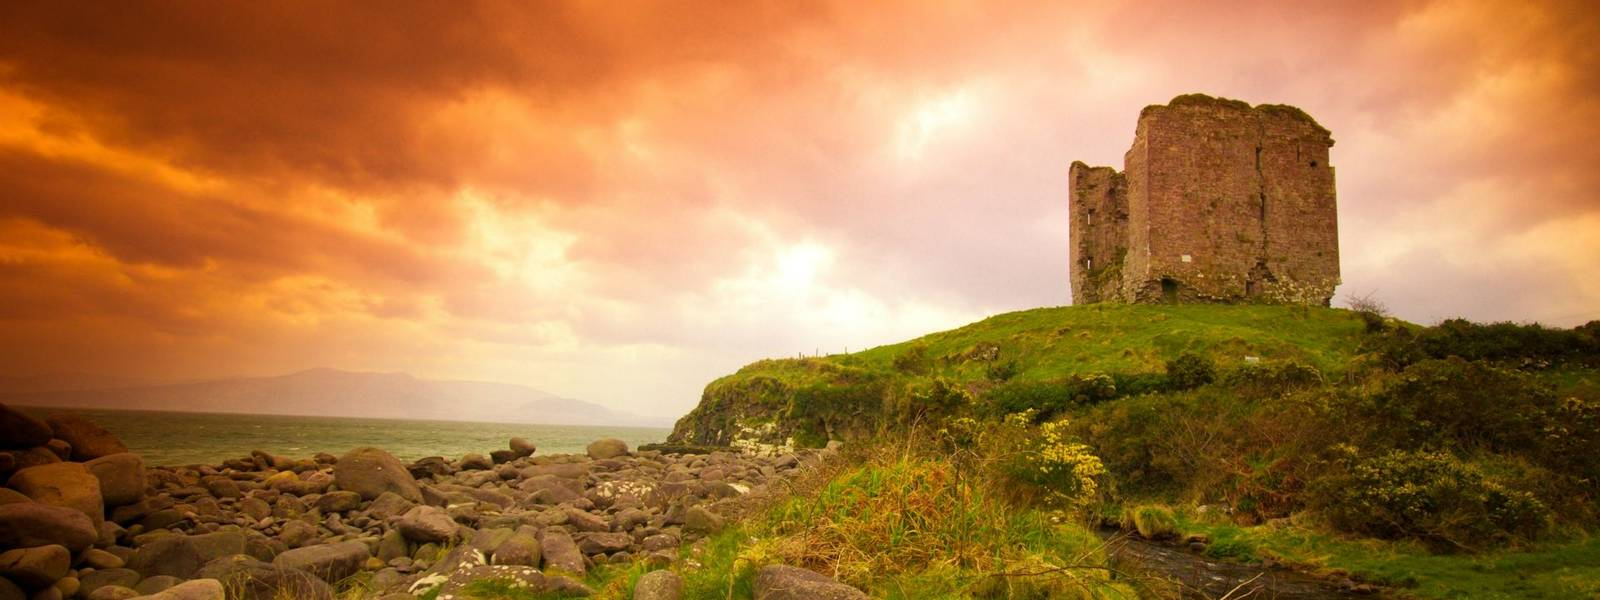 Ireland-Kerry&Cork-Kenmare-AdobeStock_59586780.jpeg